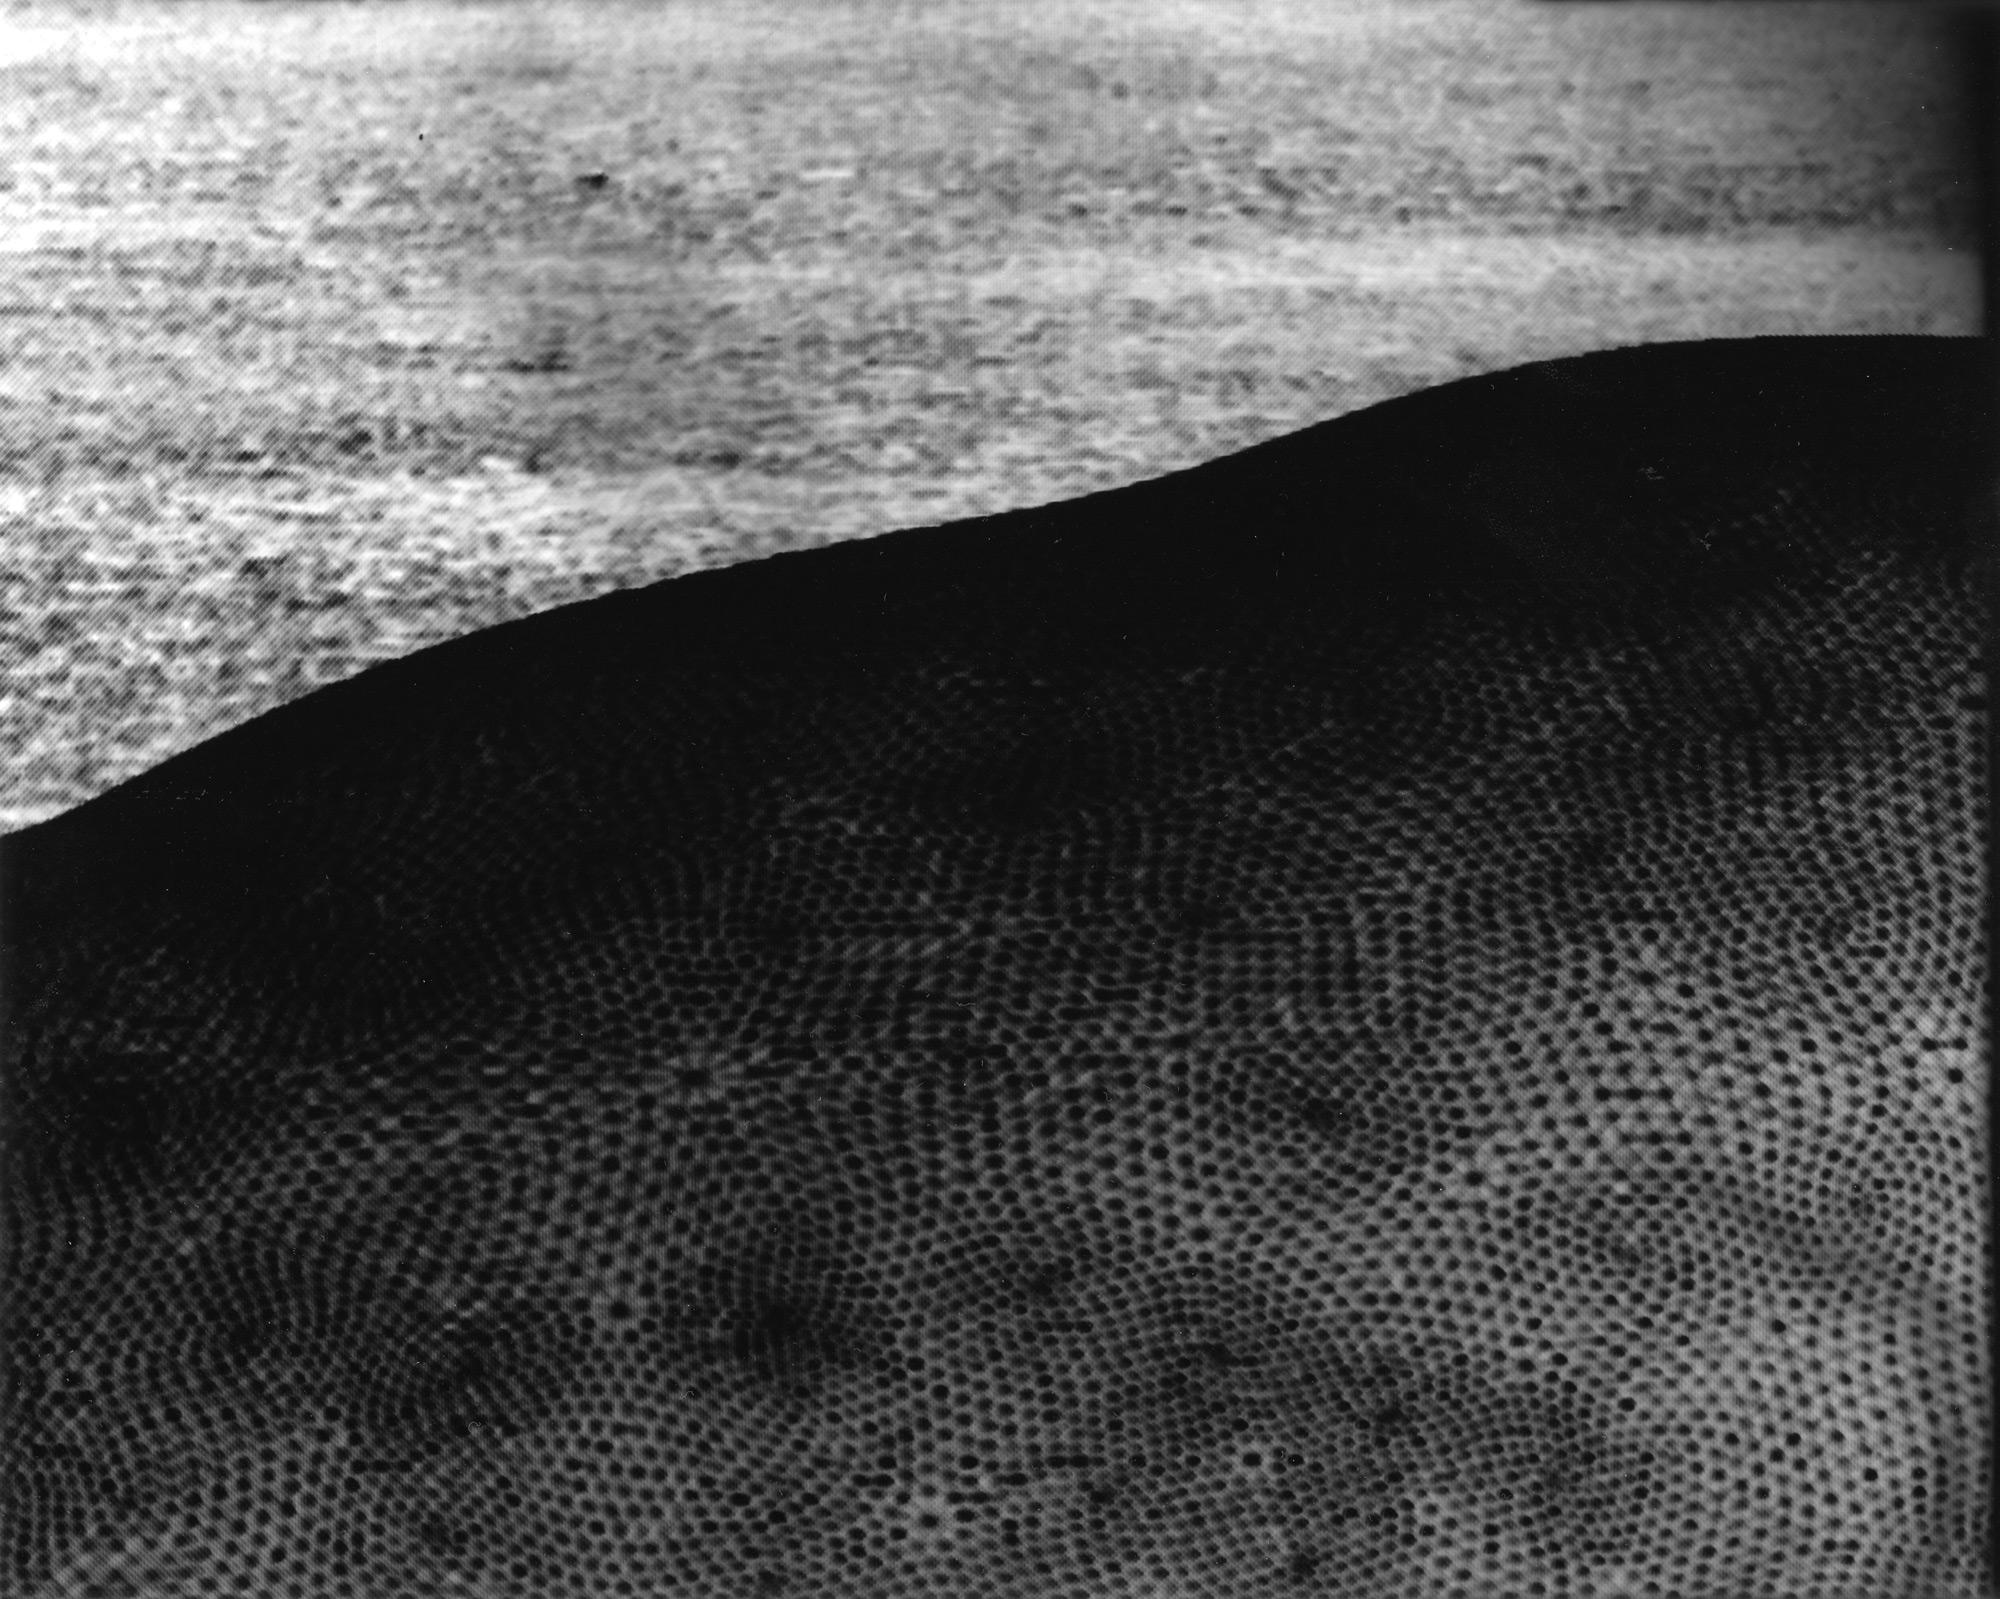 Luminogram. Digital image projected onto the photosensitive paper.